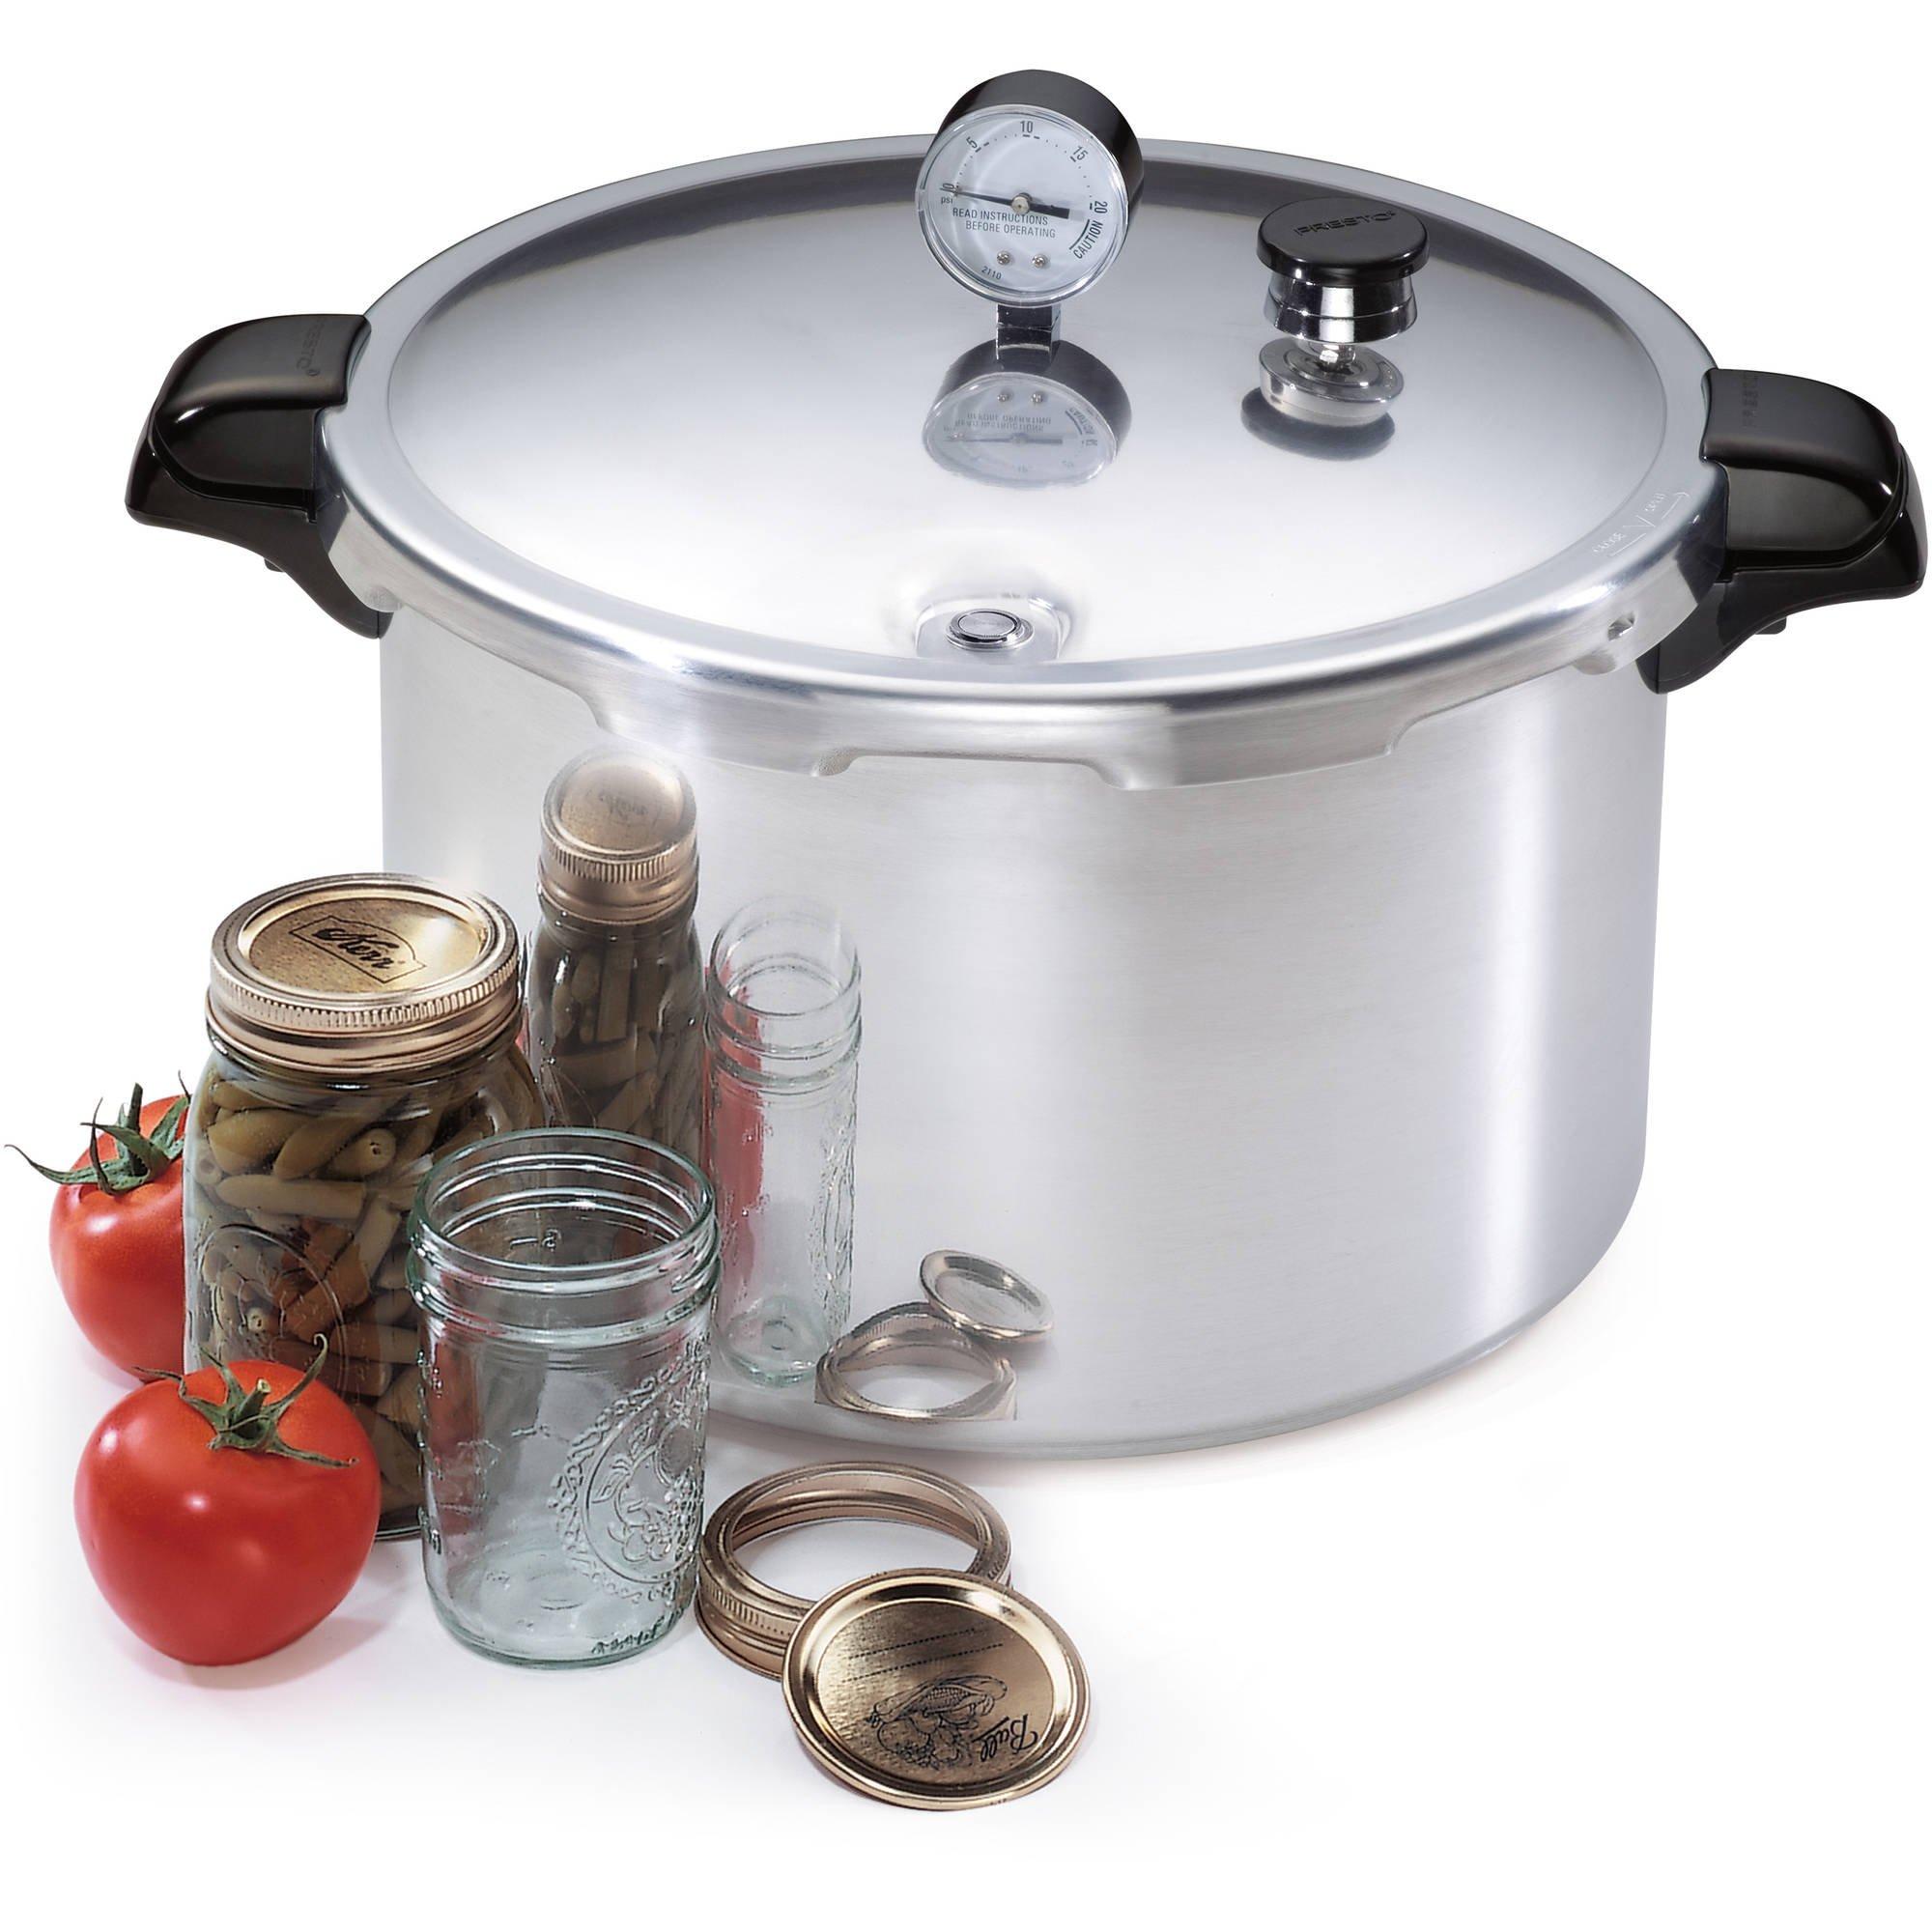 Presto Pressure Canner and Cooker (16-Quart)